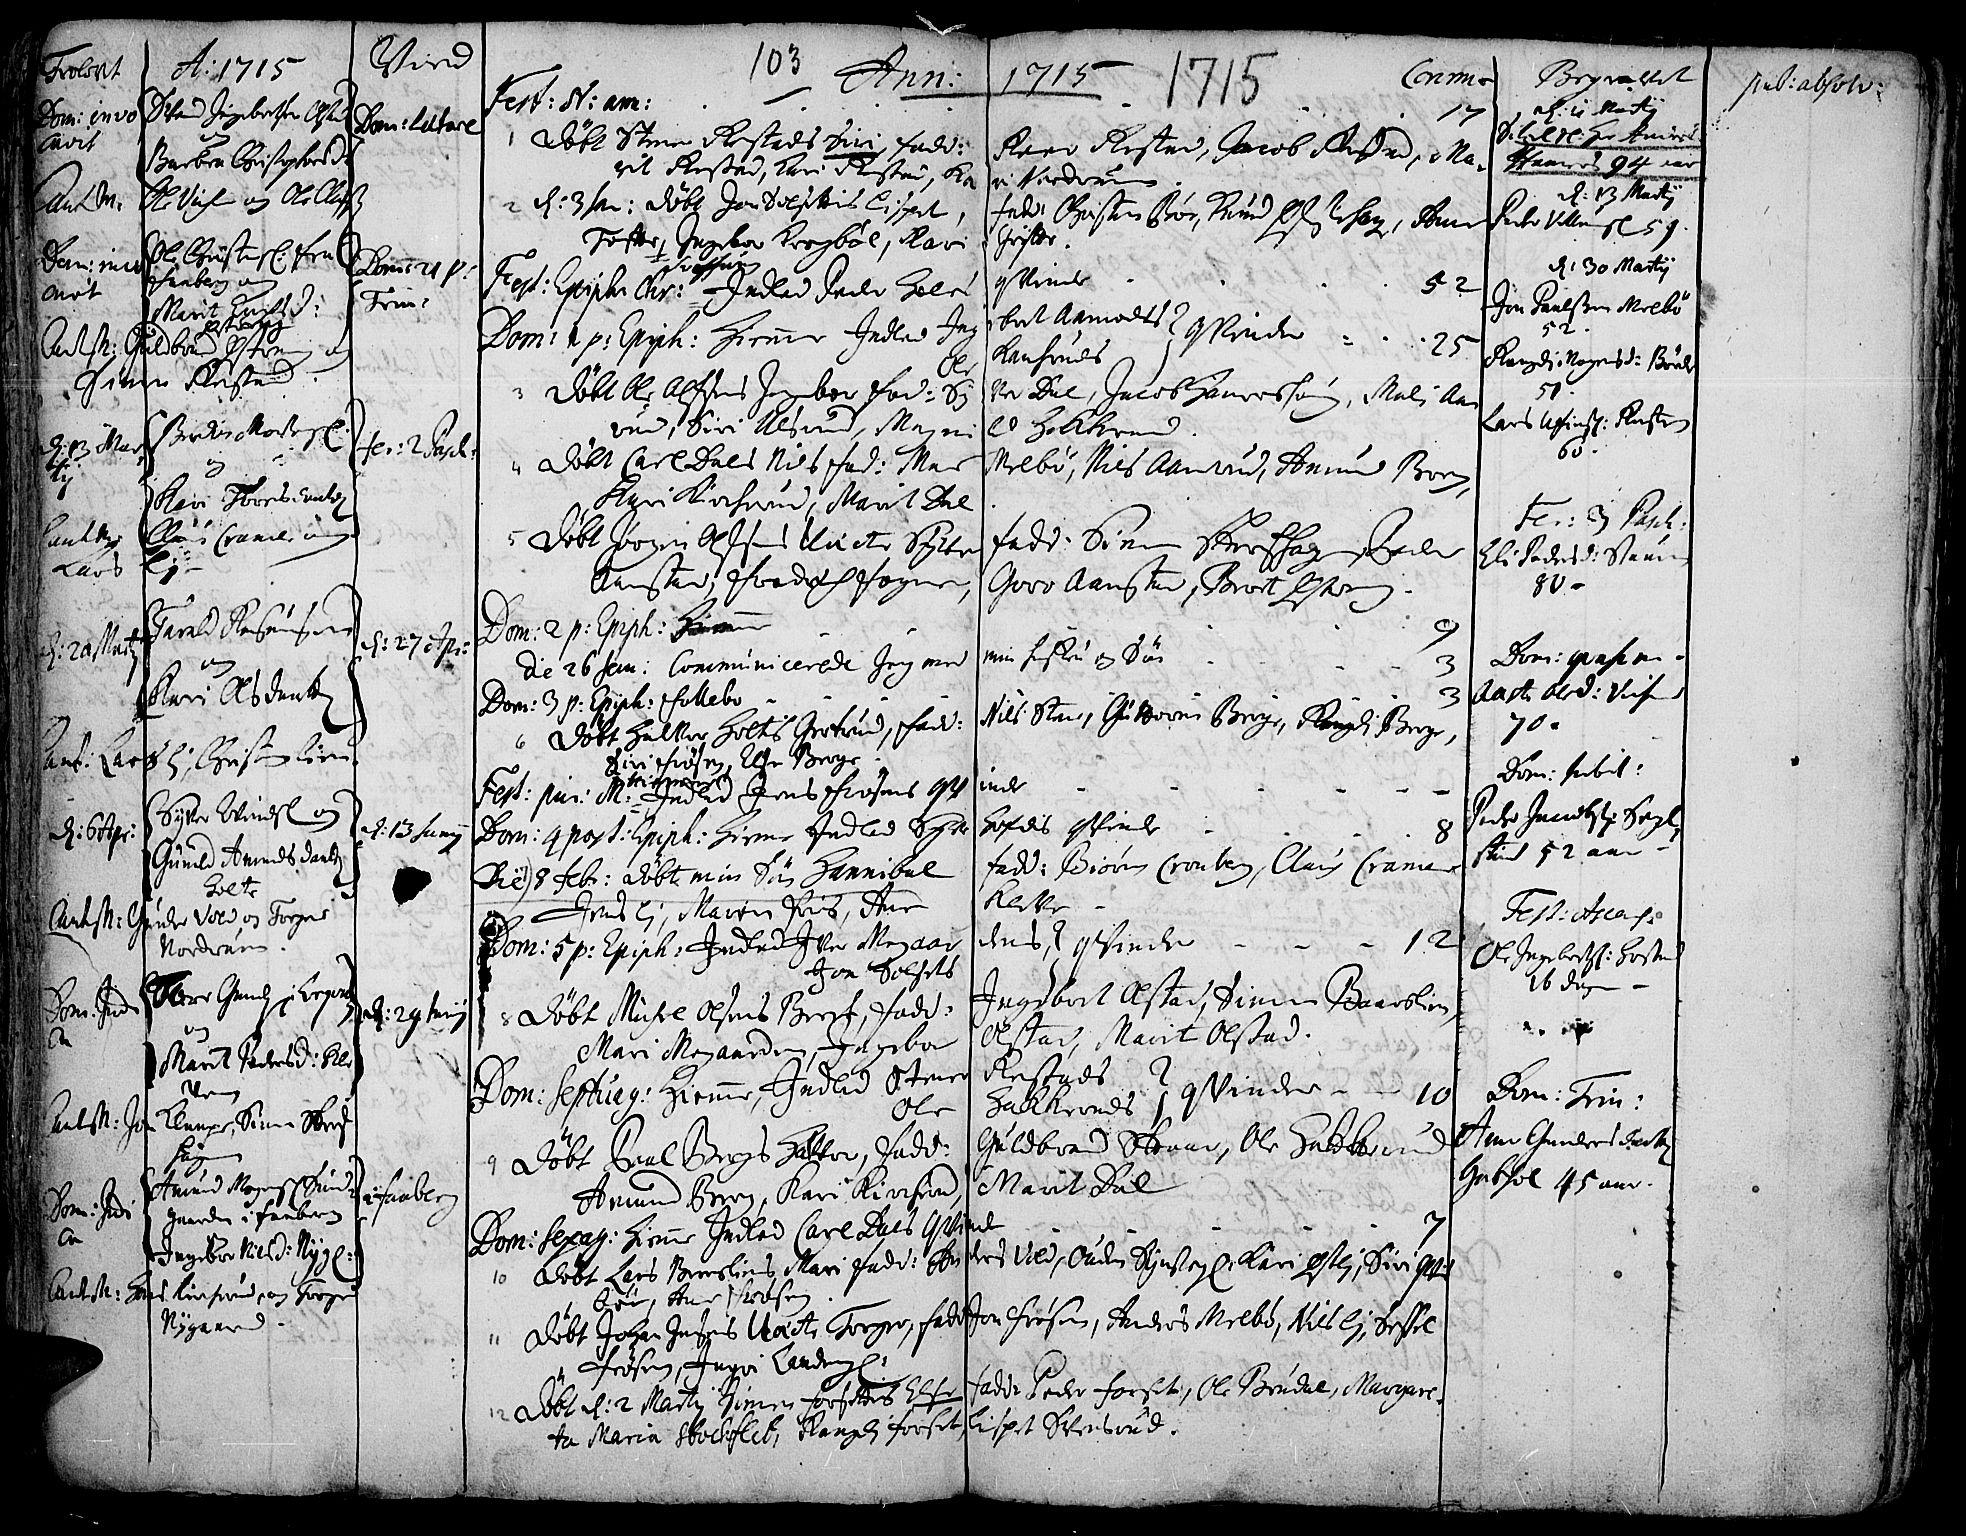 SAH, Gausdal prestekontor, Ministerialbok nr. 1, 1693-1728, s. 103